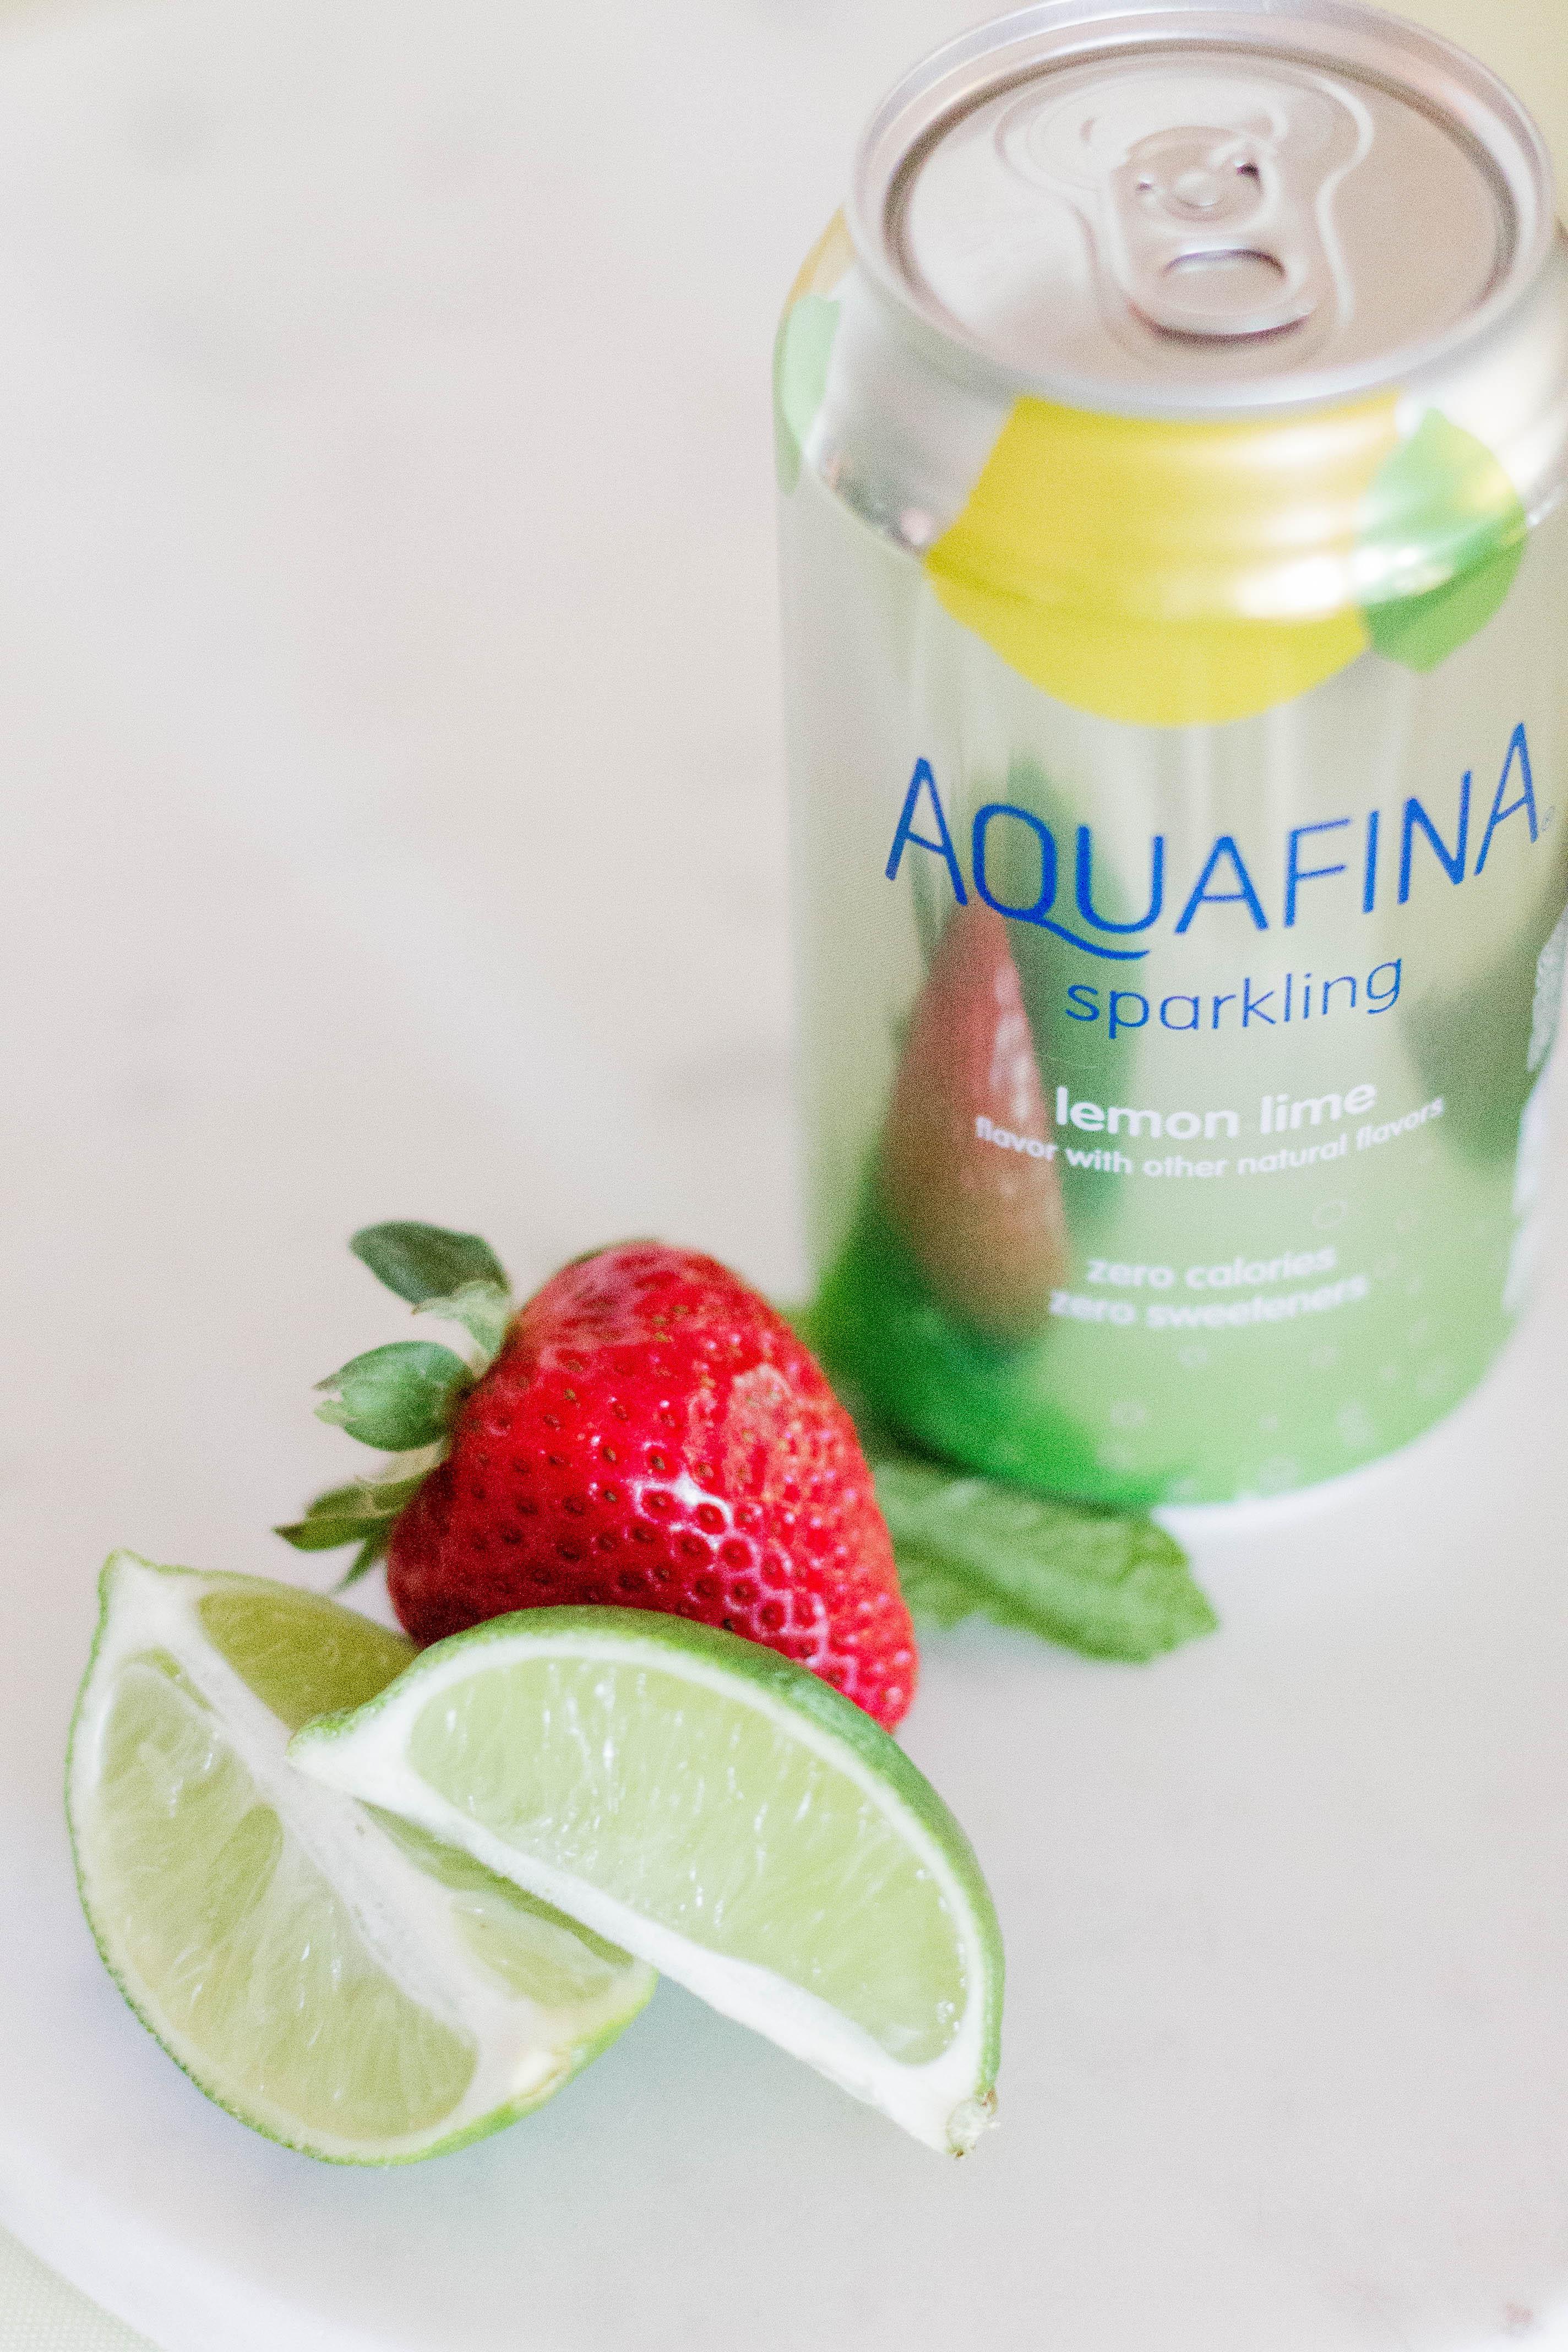 Aquafina Sparkling Water